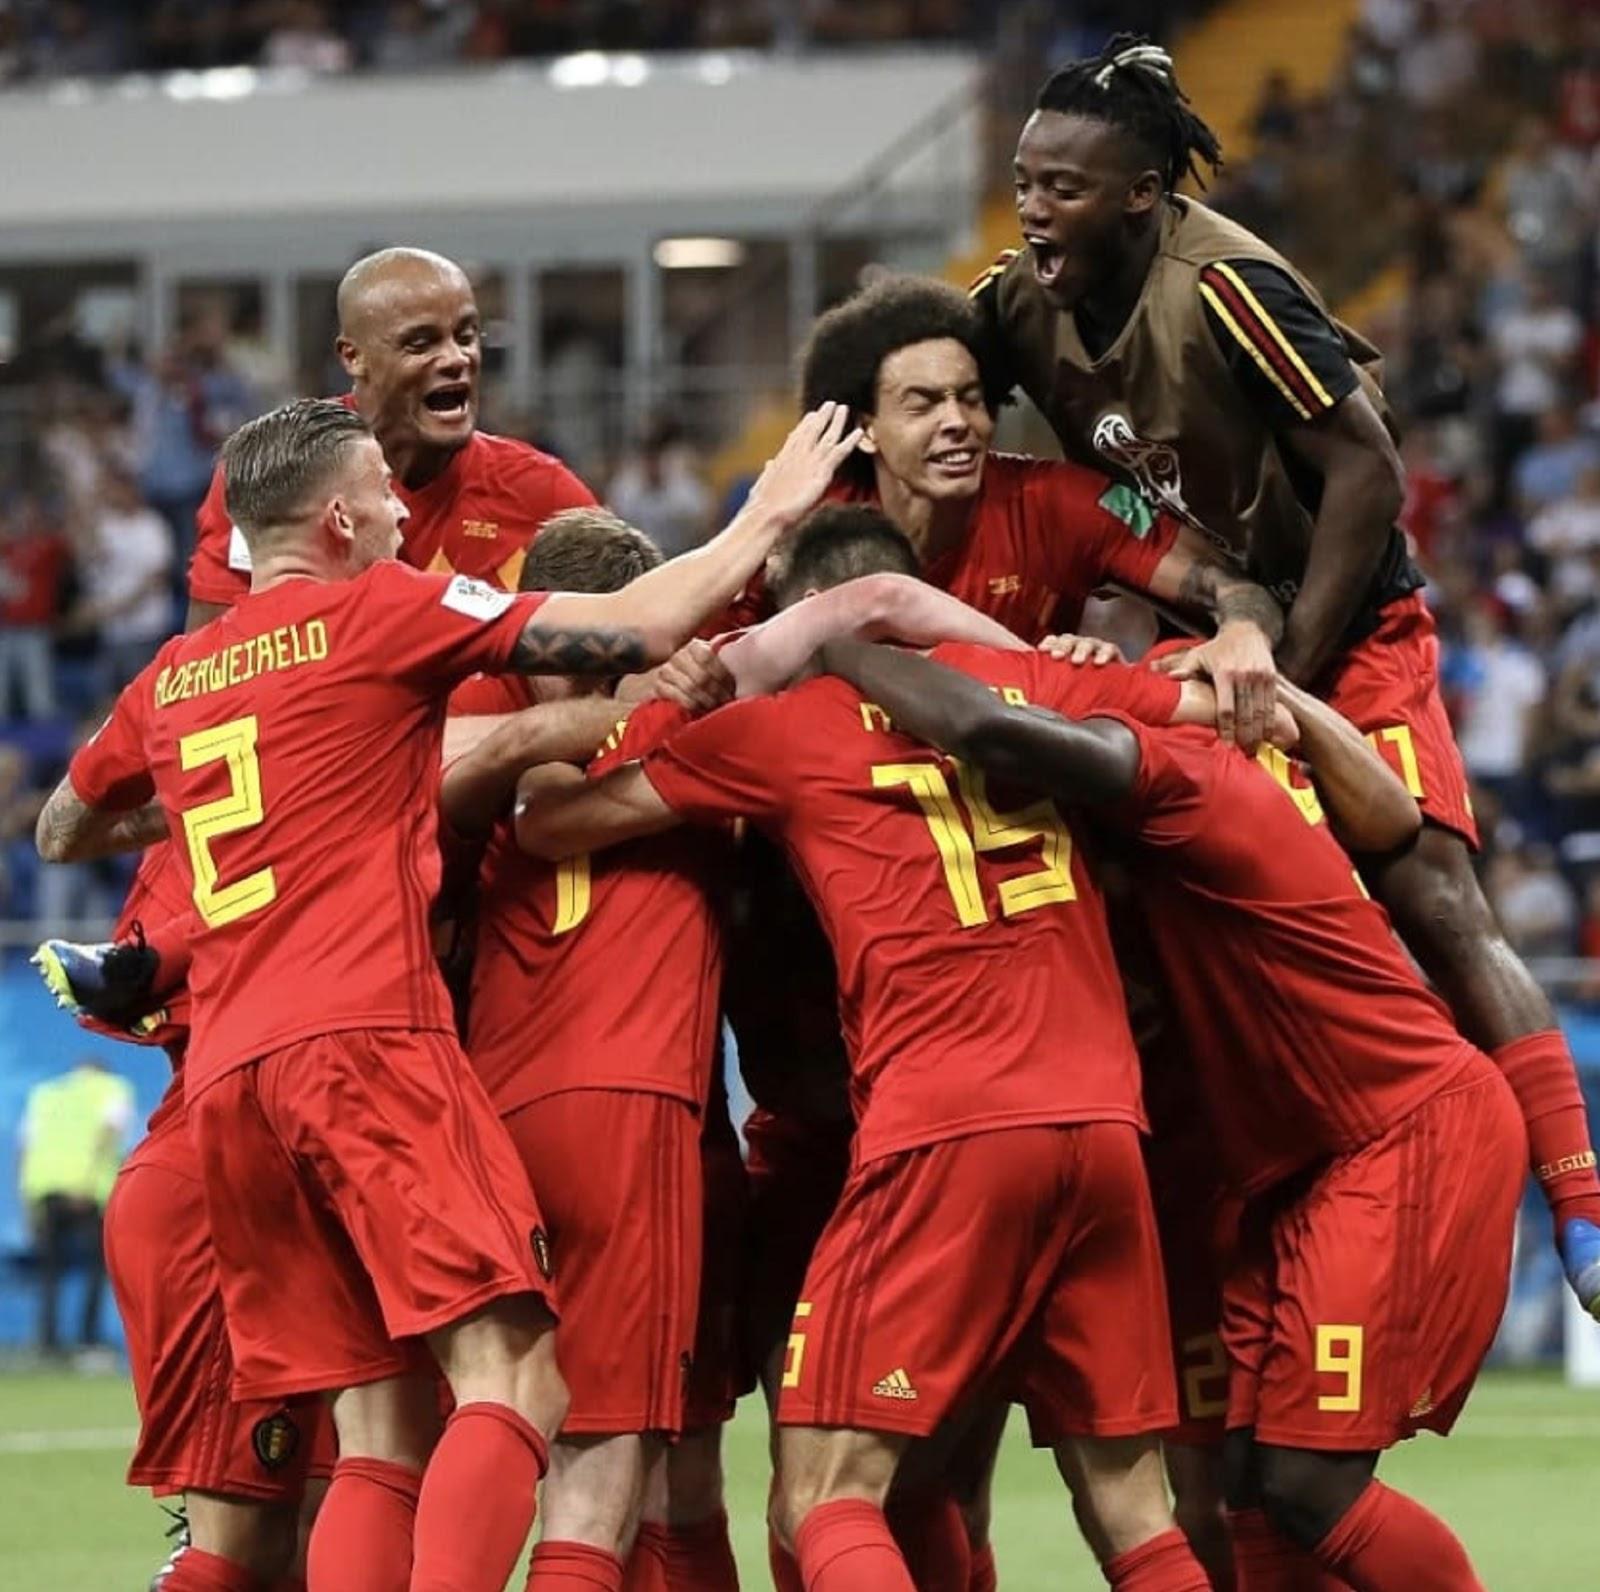 WORLD CUP, BELGIUM 2